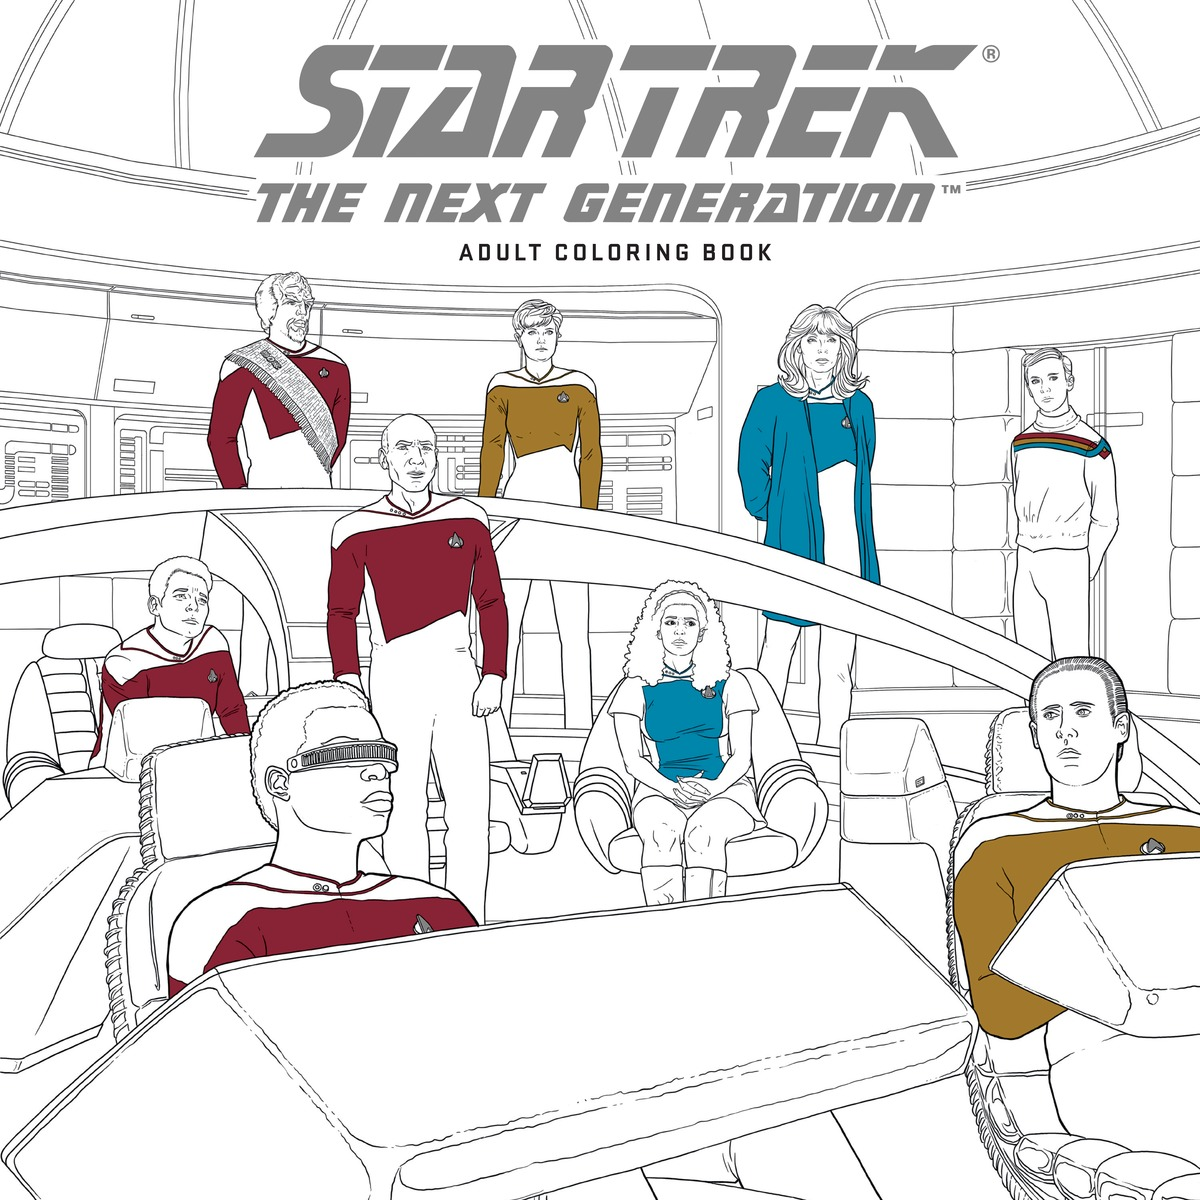 Star Trek: The Next Generation: Adult Coloring Book generation next